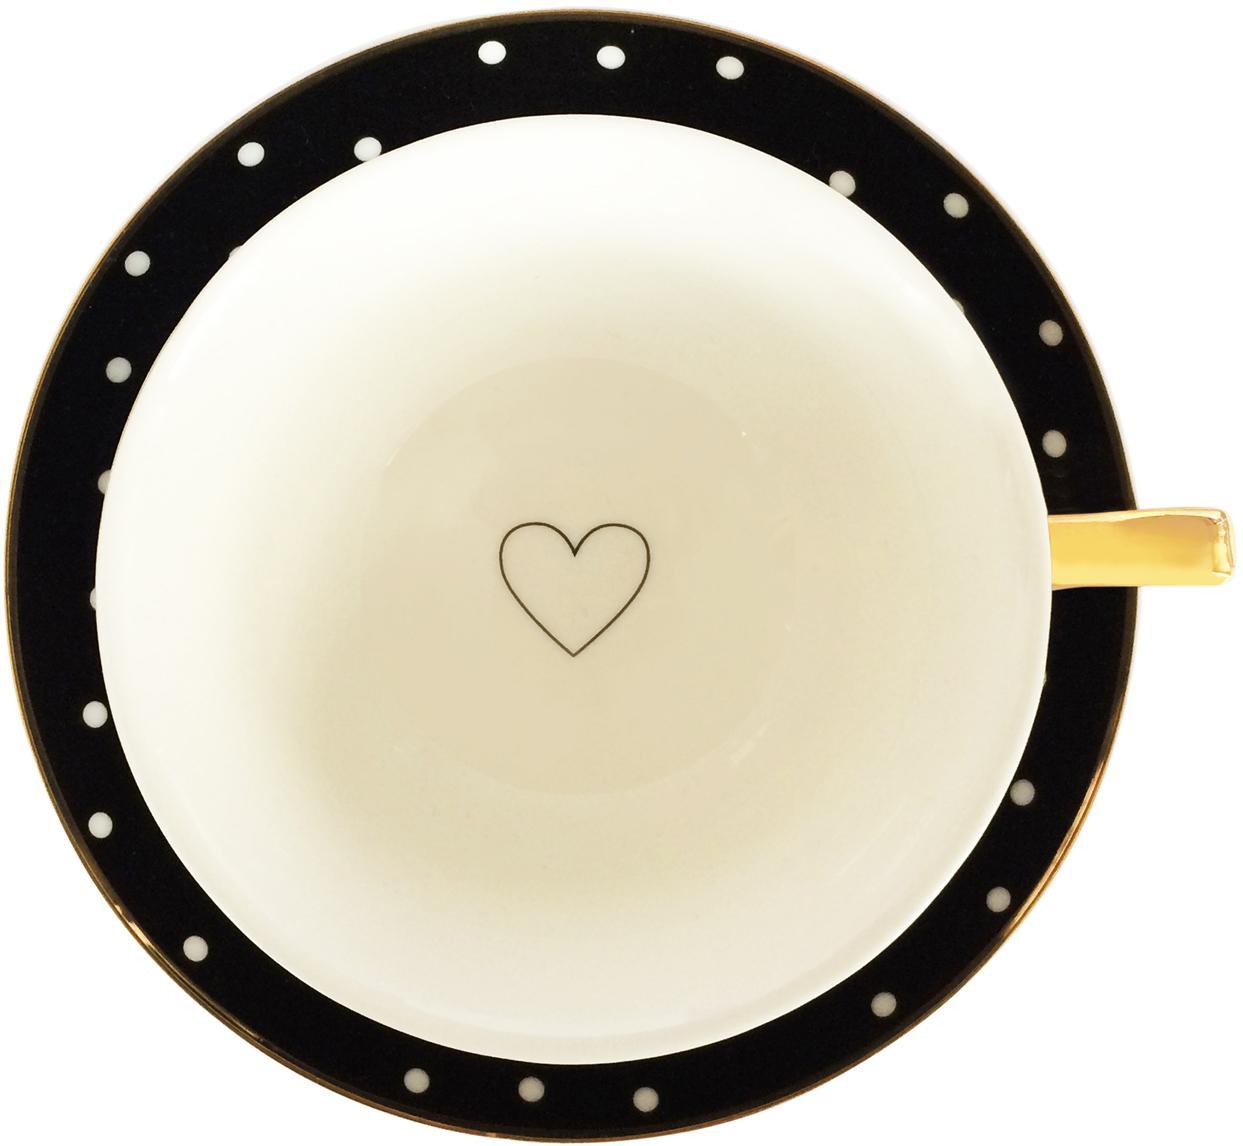 Tazza da tè Spotty, 2 pz., Porcellana cinese dorata, Nero, bianco Bordo e manico: dorato, Ø 15 x Alt. 6 cm